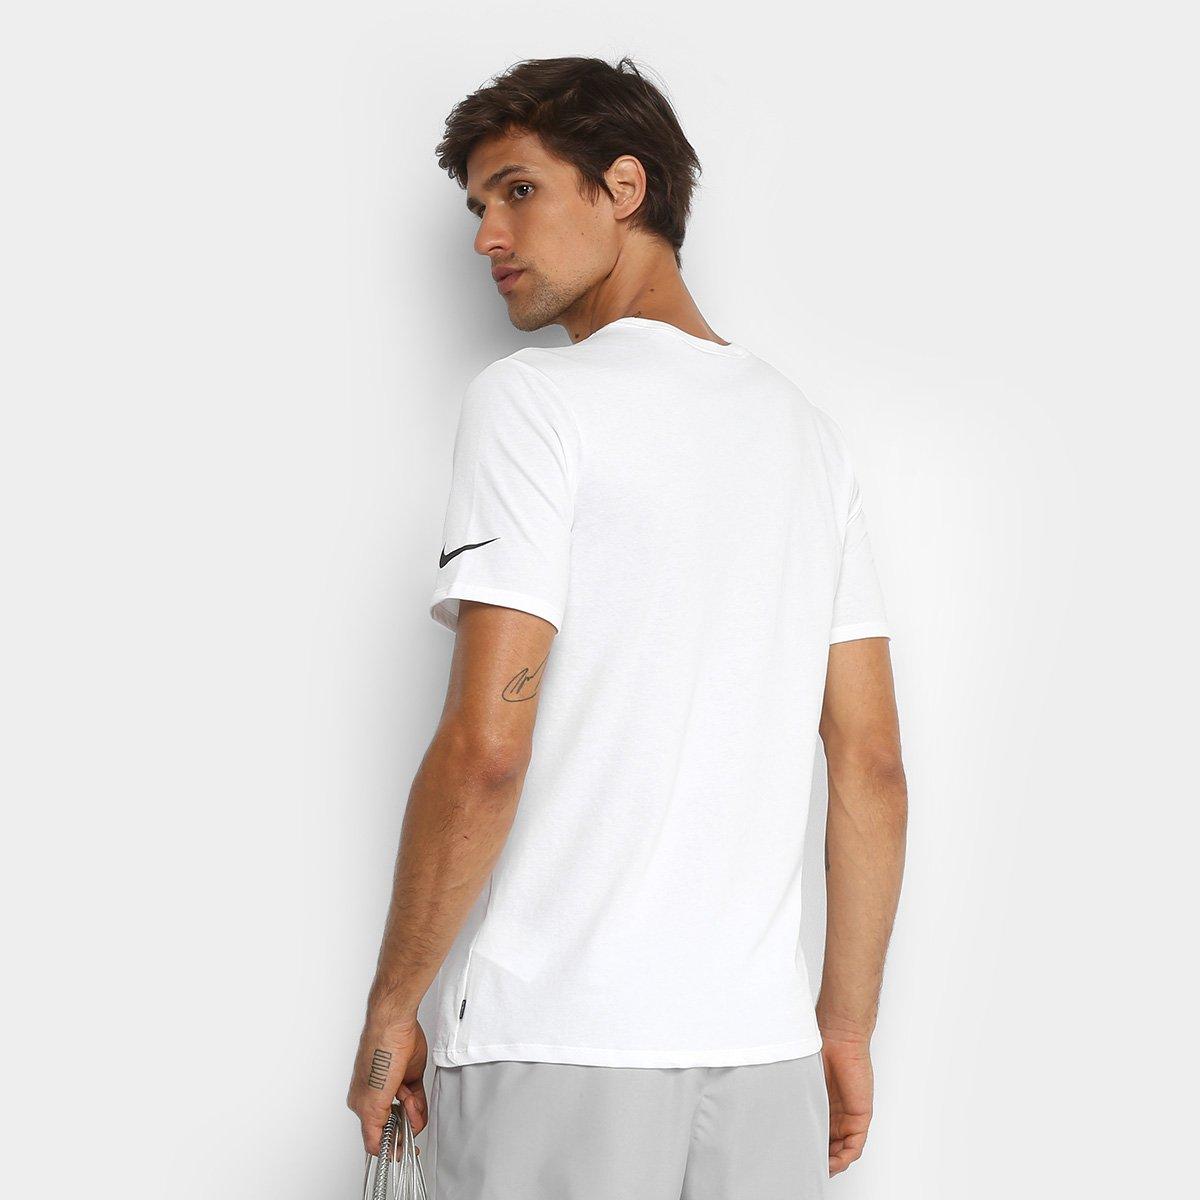 Camiseta Nike Dry Just Do It Masculina - Branco - Compre Agora  067dafae07a05